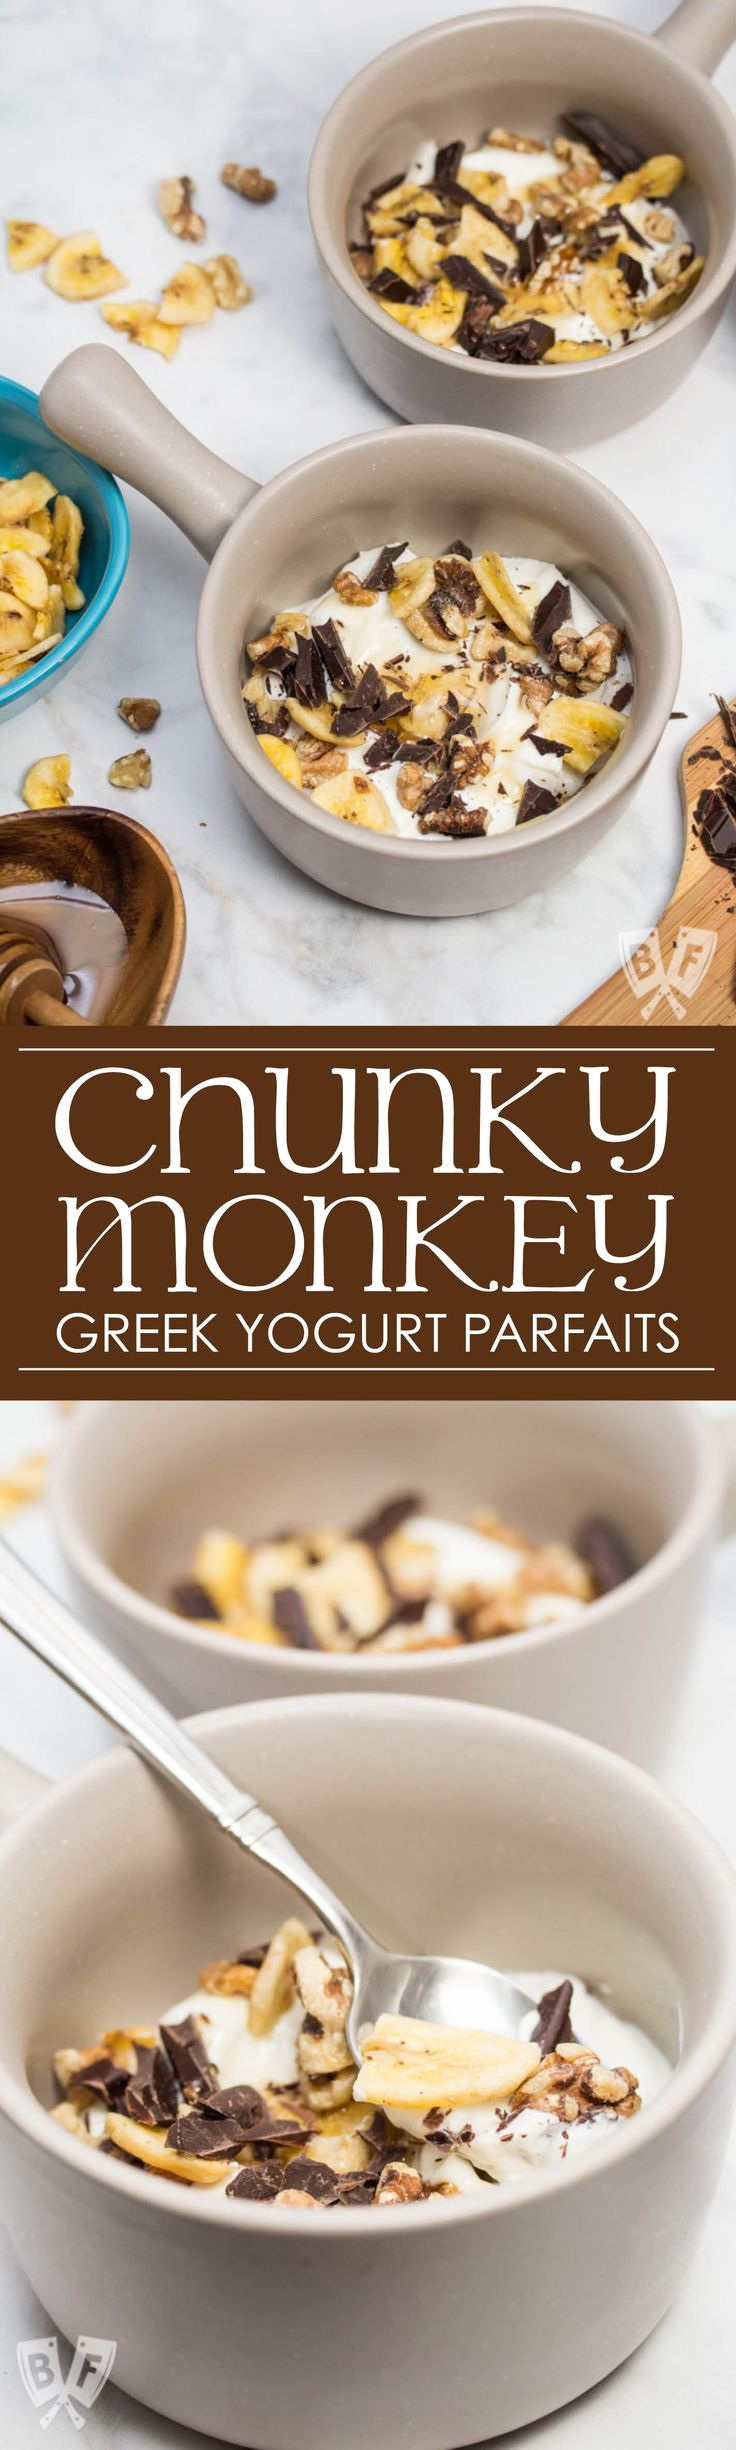 Chunky Monkey Greek Yogurt Parfaits: Chunks of premium dark chocolate, banana chips, toasted walnuts + a drizzle of honey bring these dessert-inspired breakfast parfaits to the next level! #StonyfieldBlogger #TheWholeYou #ad